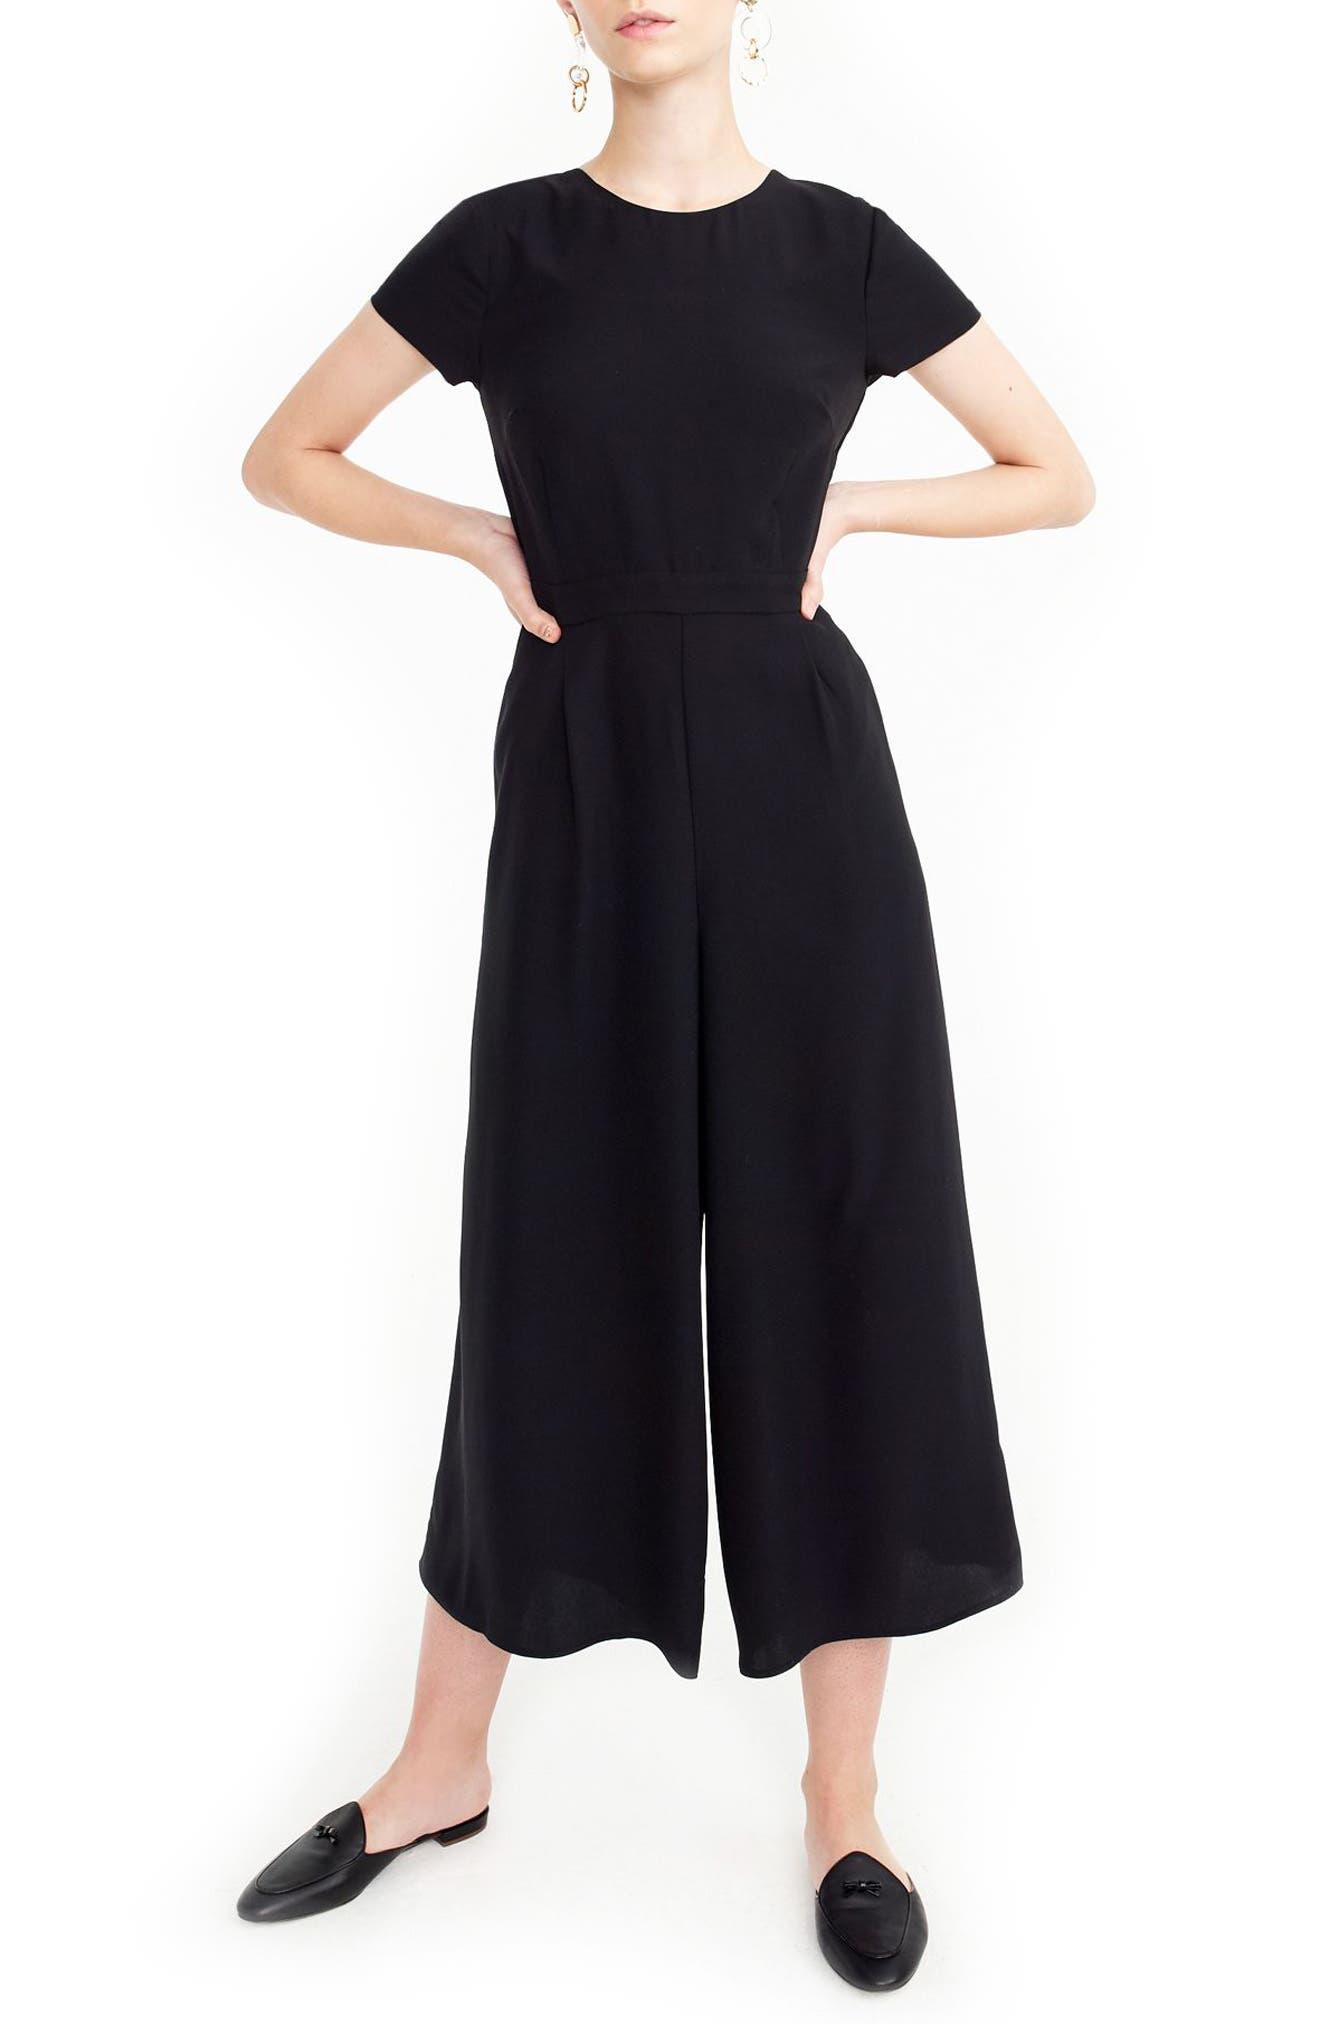 J crew colorblock silk v-back dress